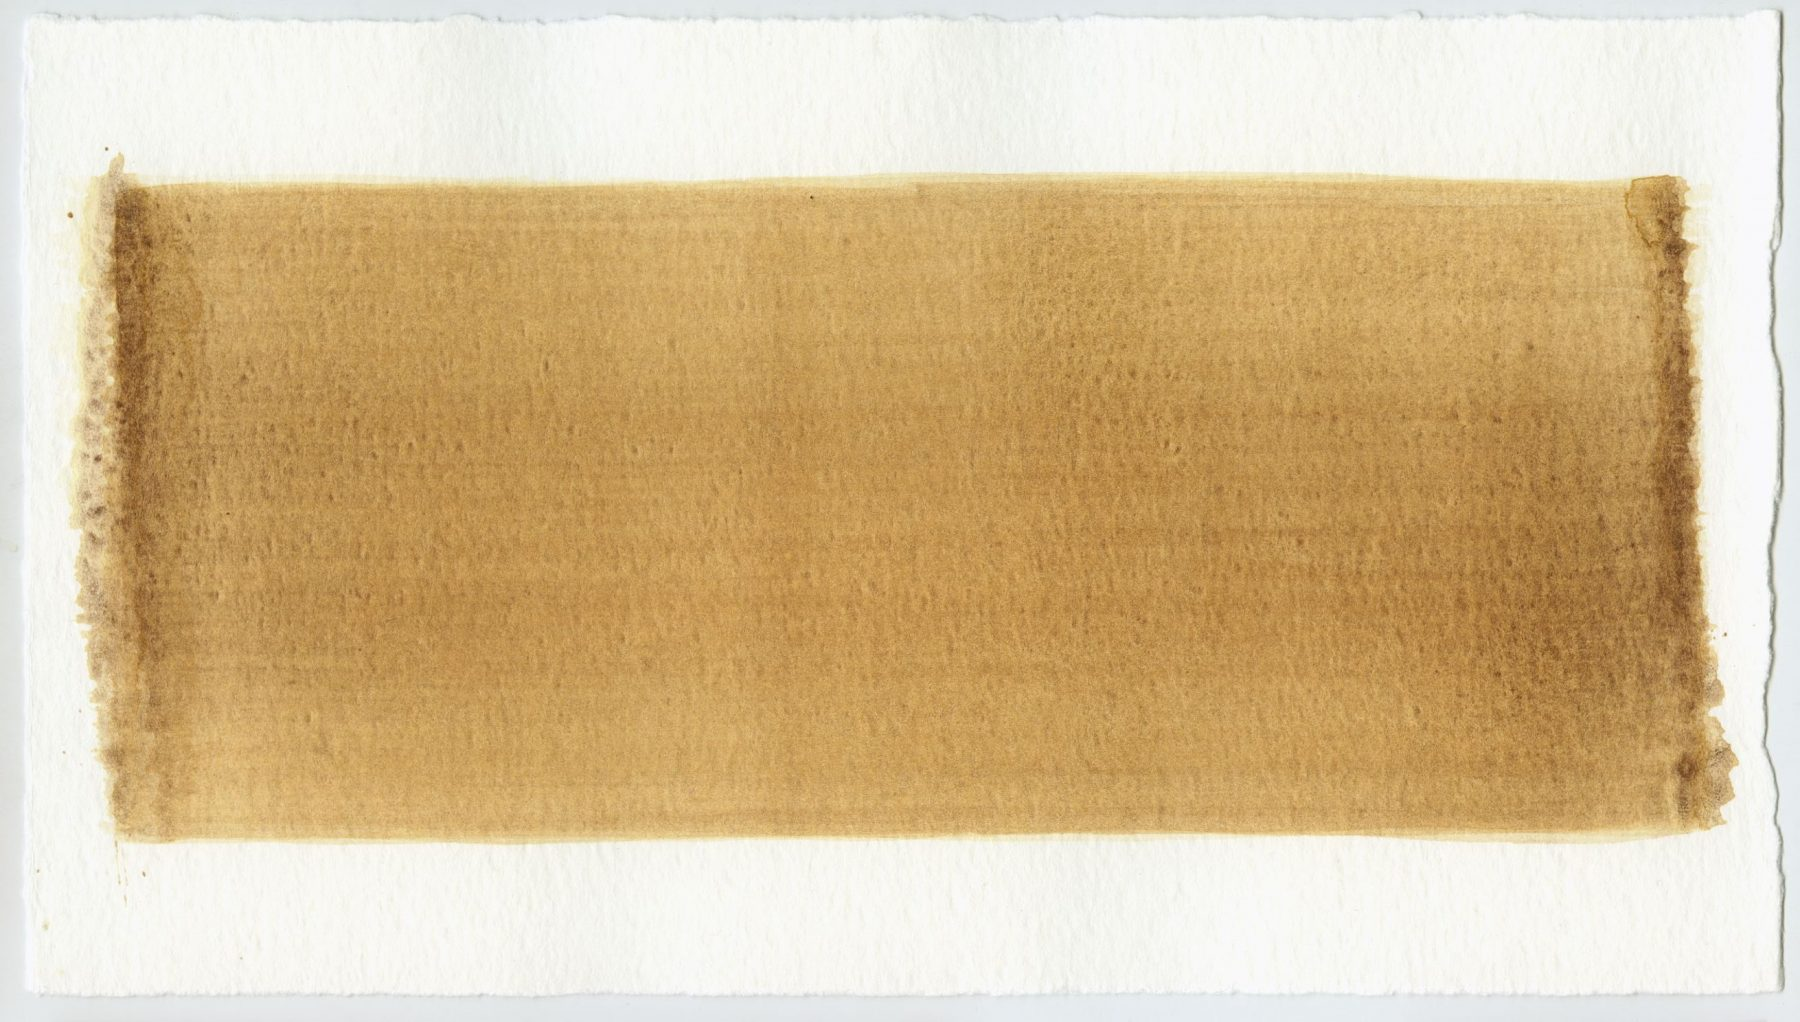 Brush stroke no. 83 - Selfmade pigment: IJzeroer